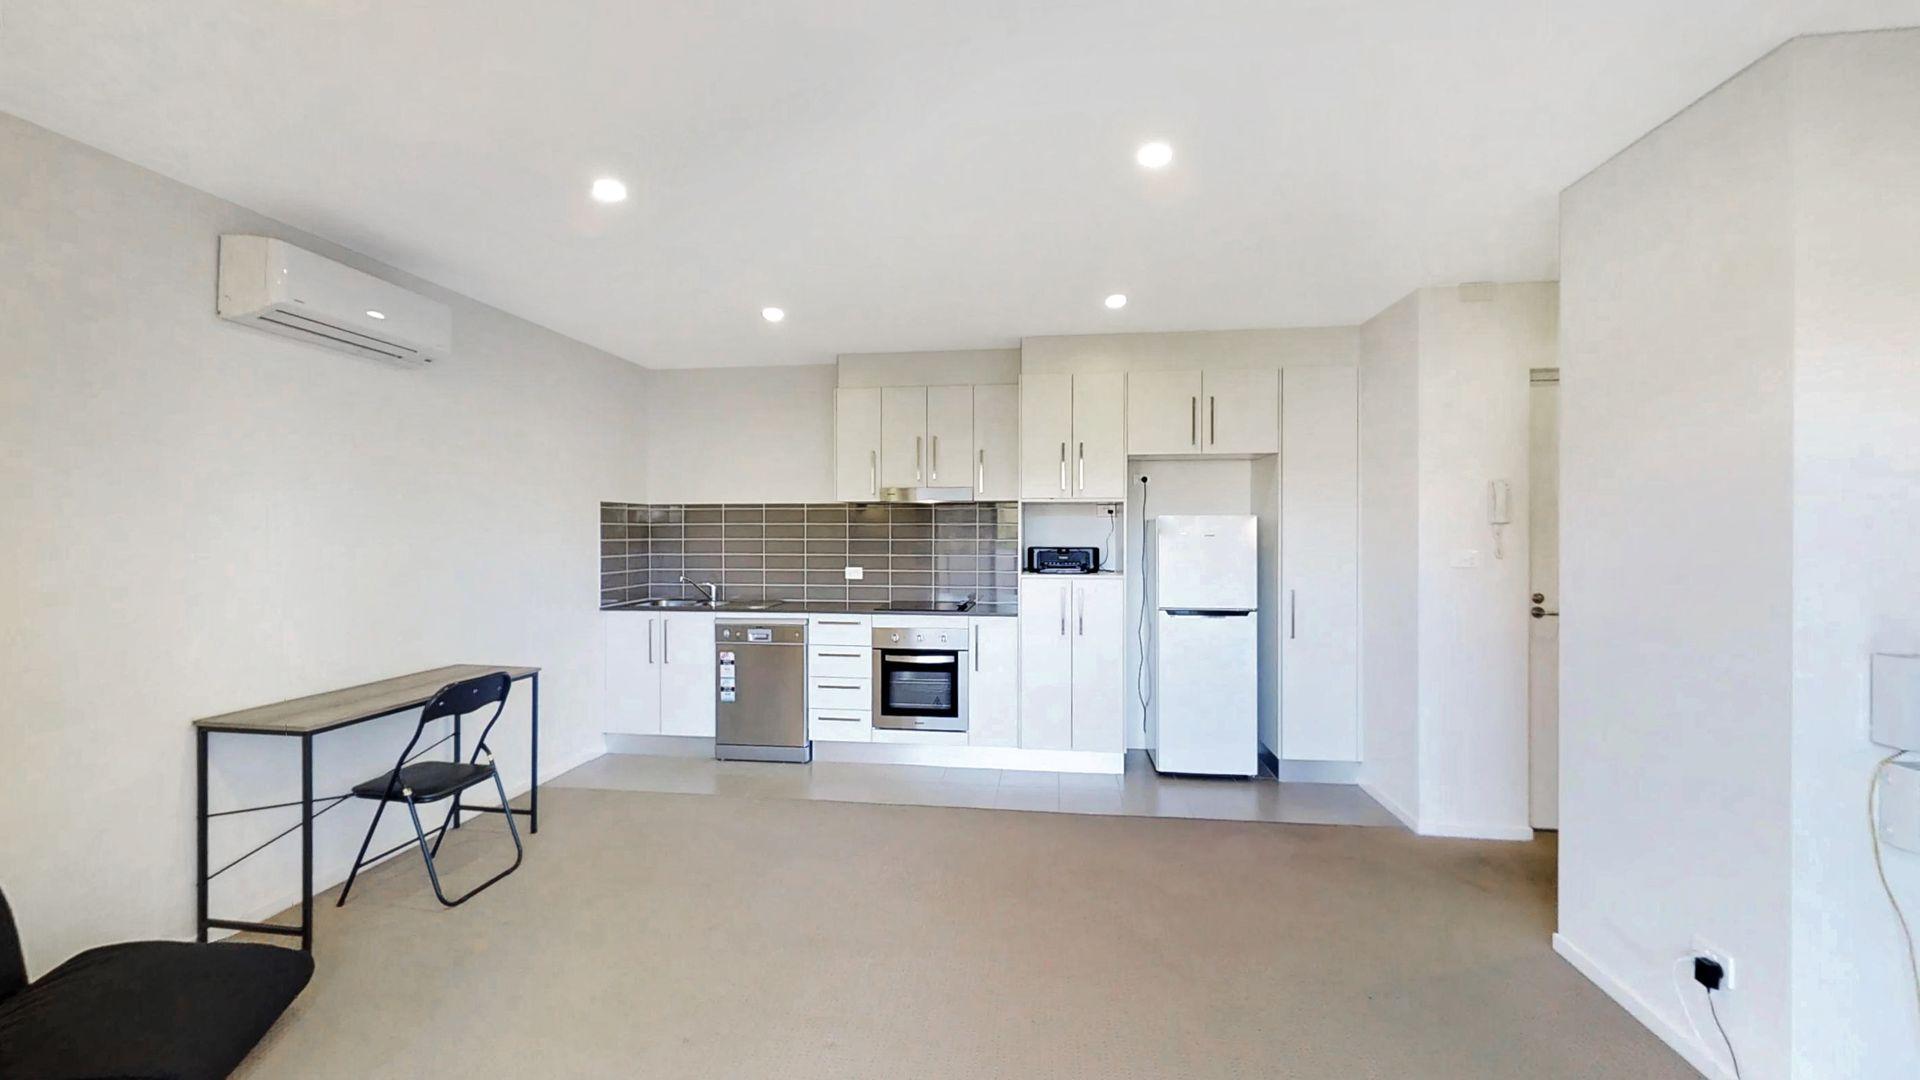 14/36 Antill Street, Queanbeyan NSW 2620, Image 1